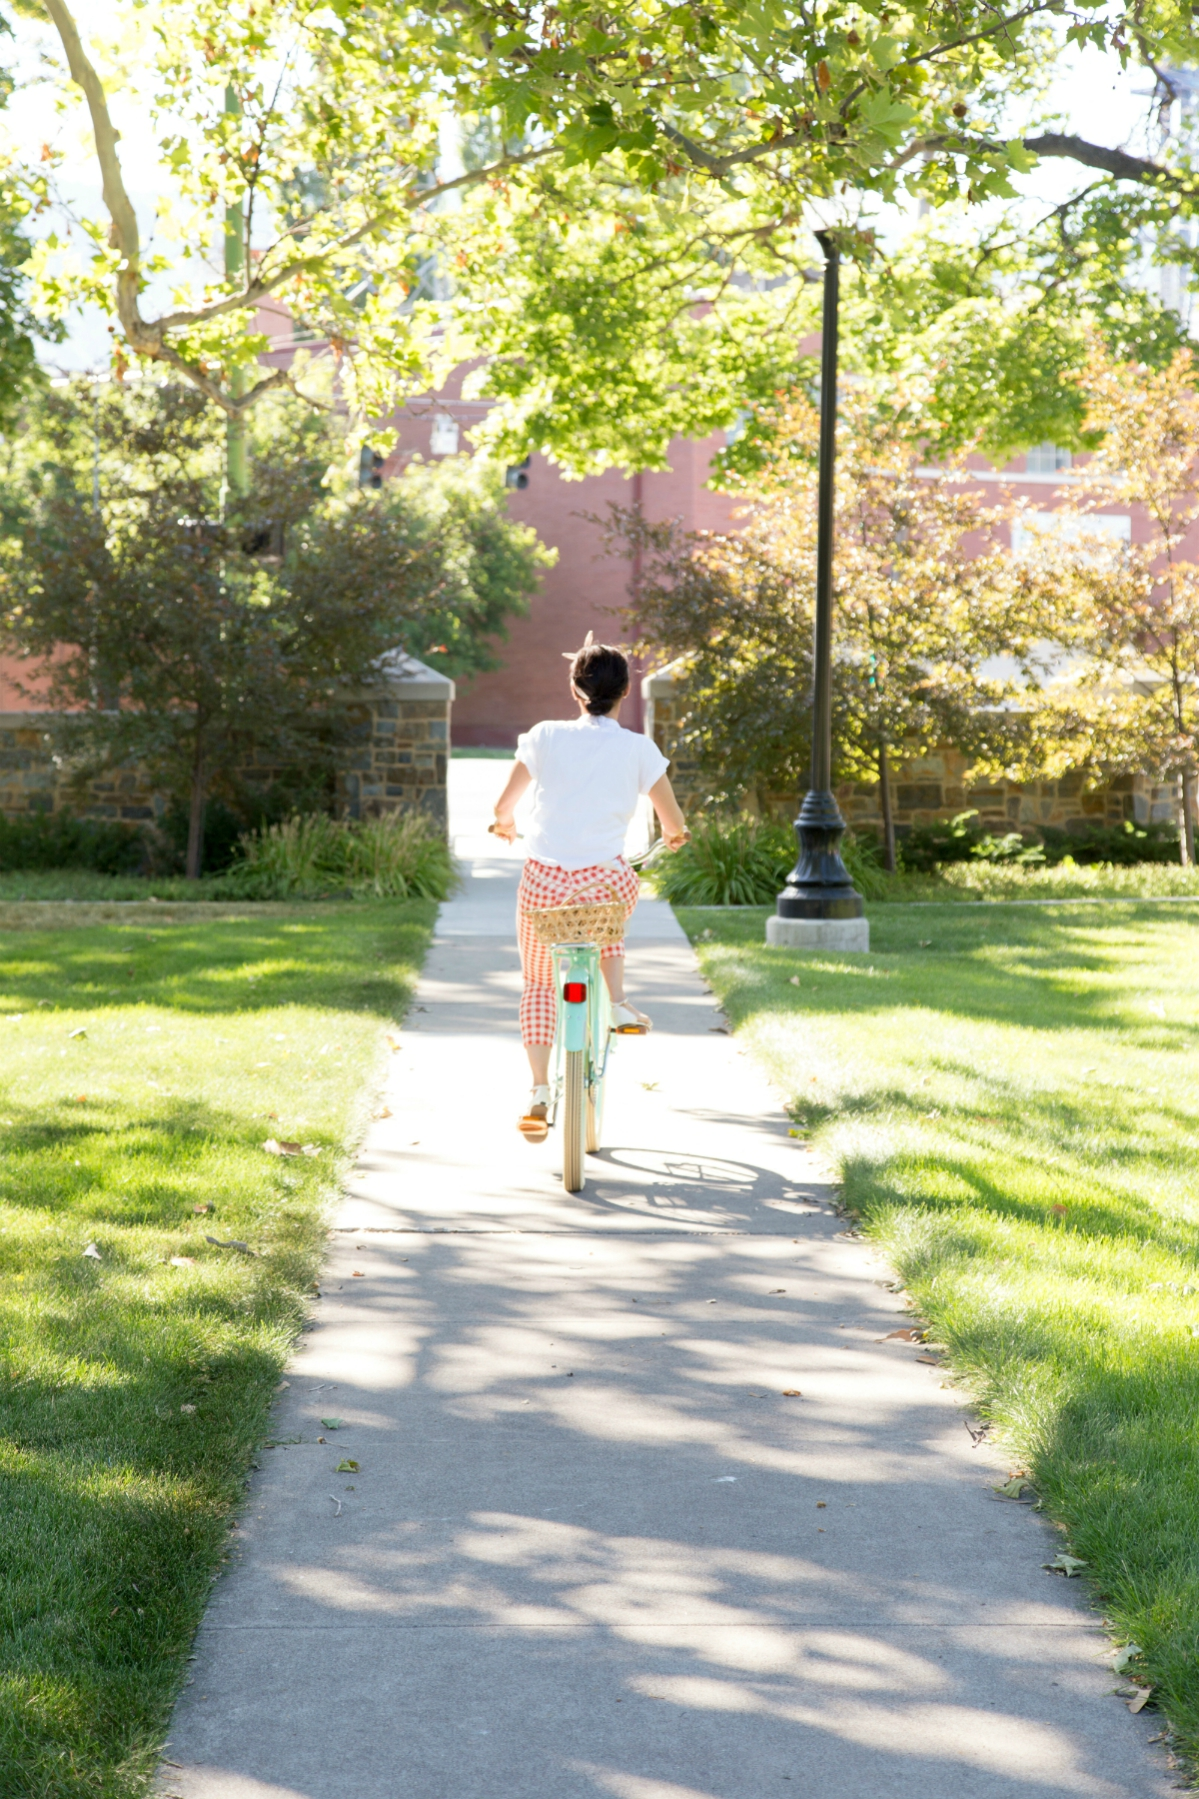 The Sugared Lemon summer cruiser bicycle